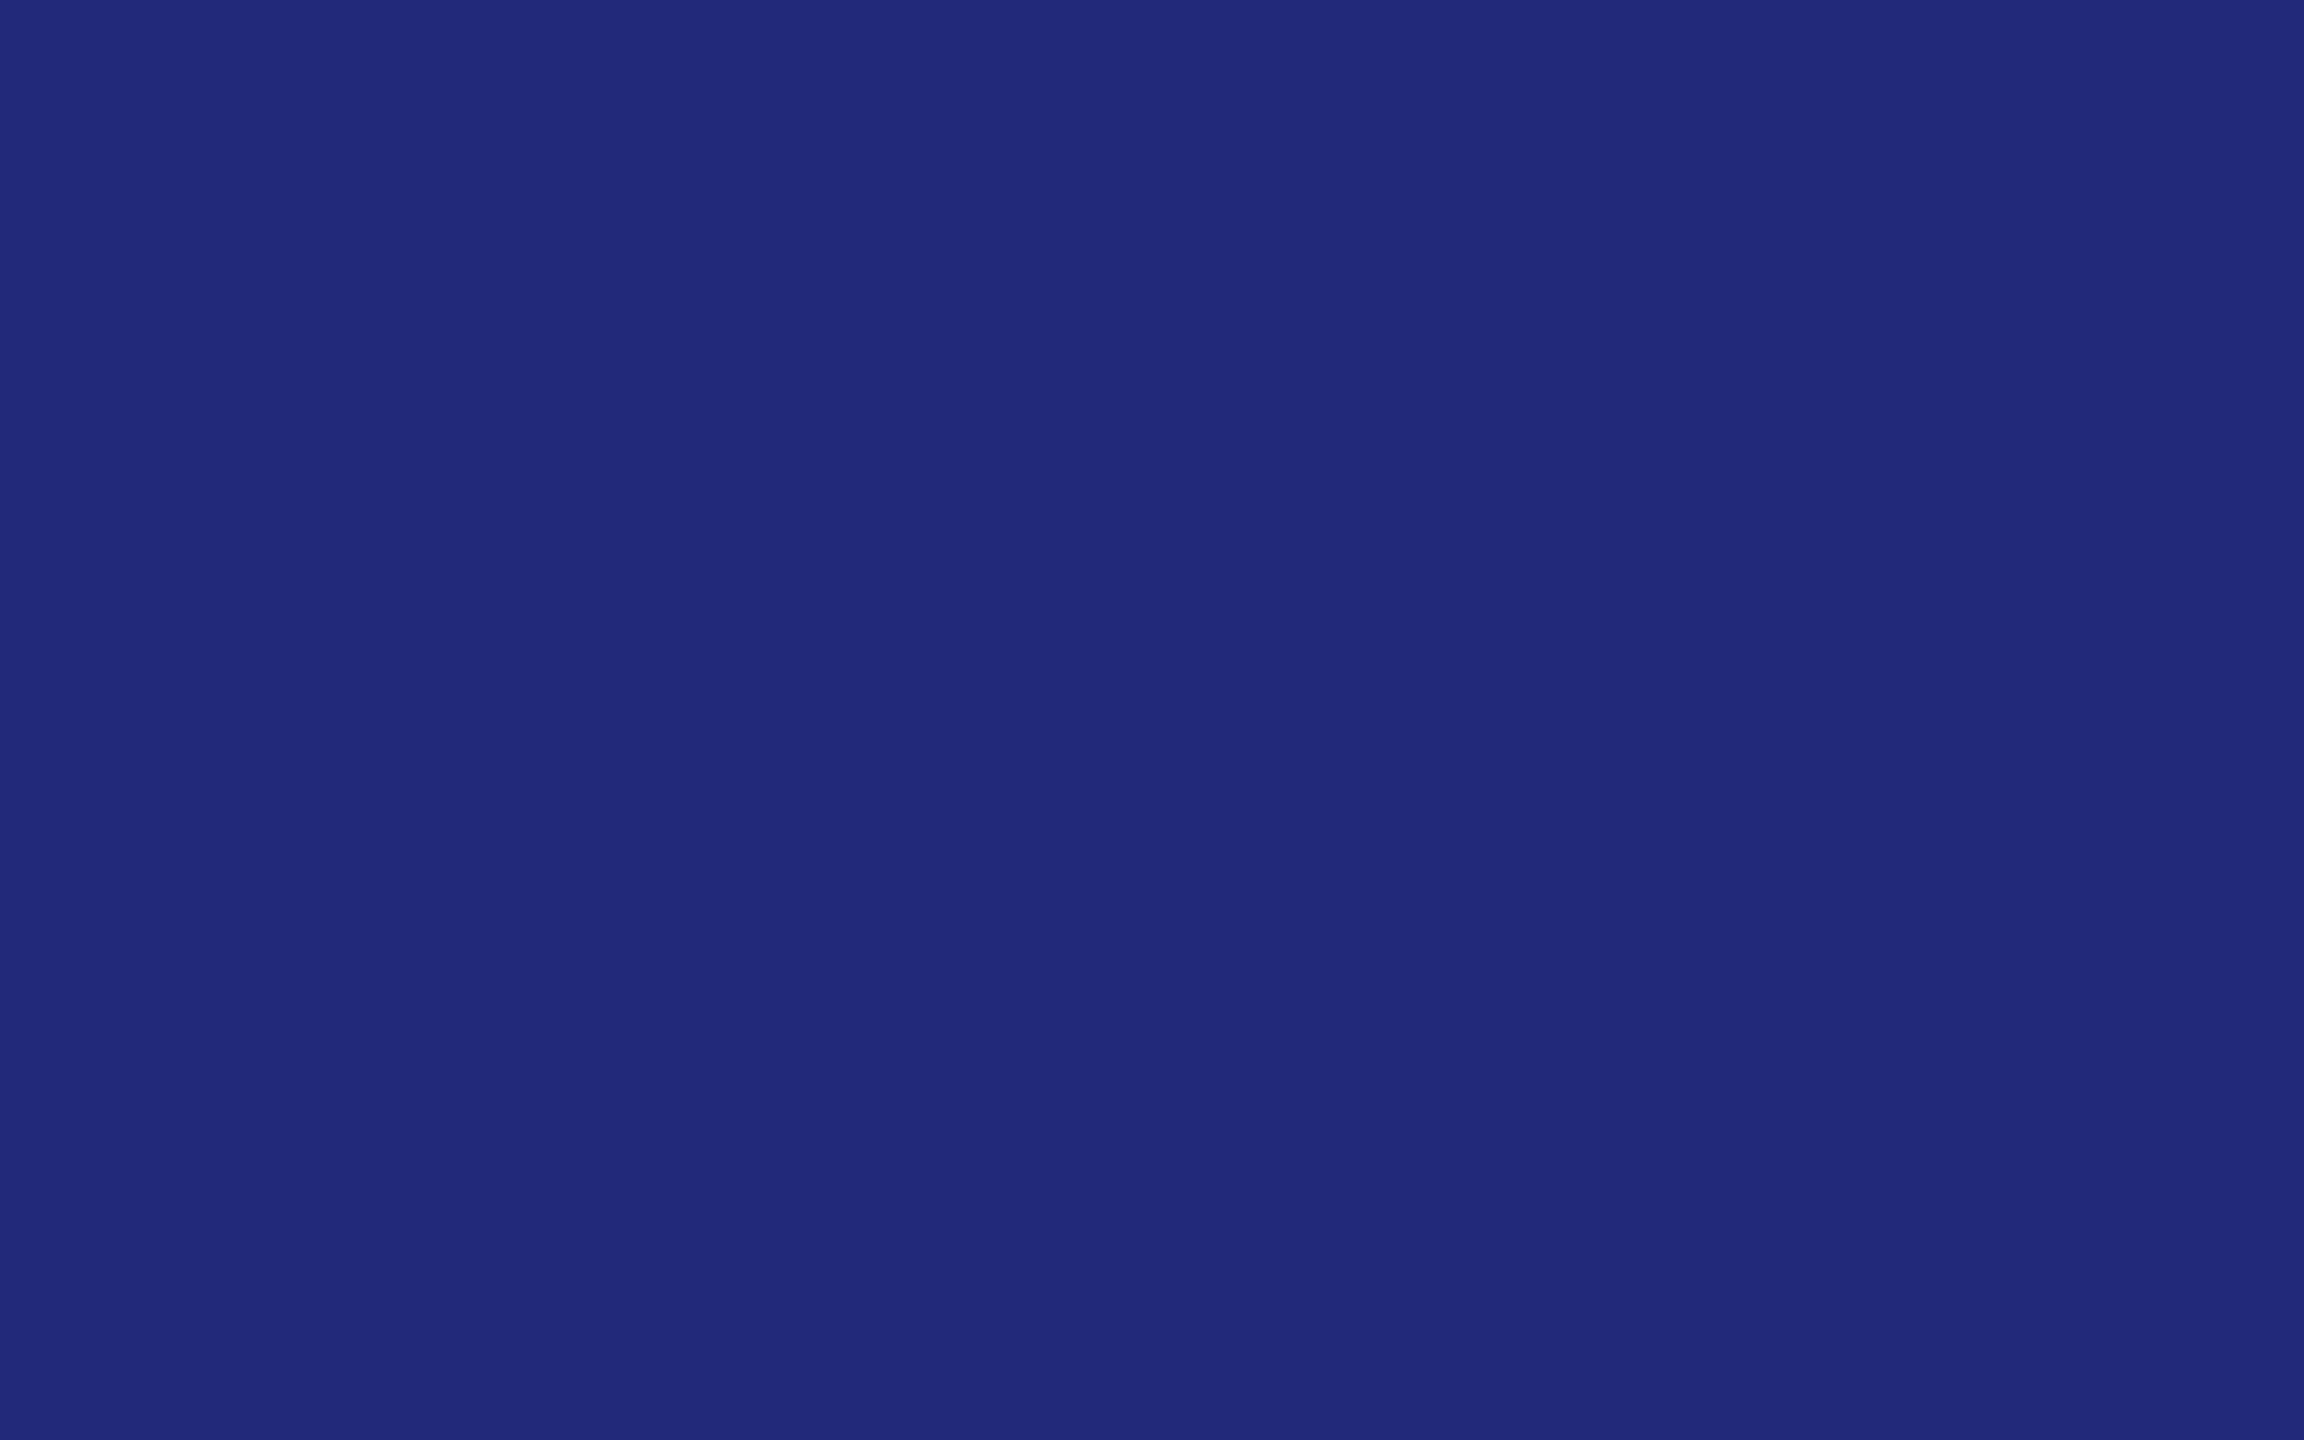 2304x1440 St Patricks Blue Solid Color Background